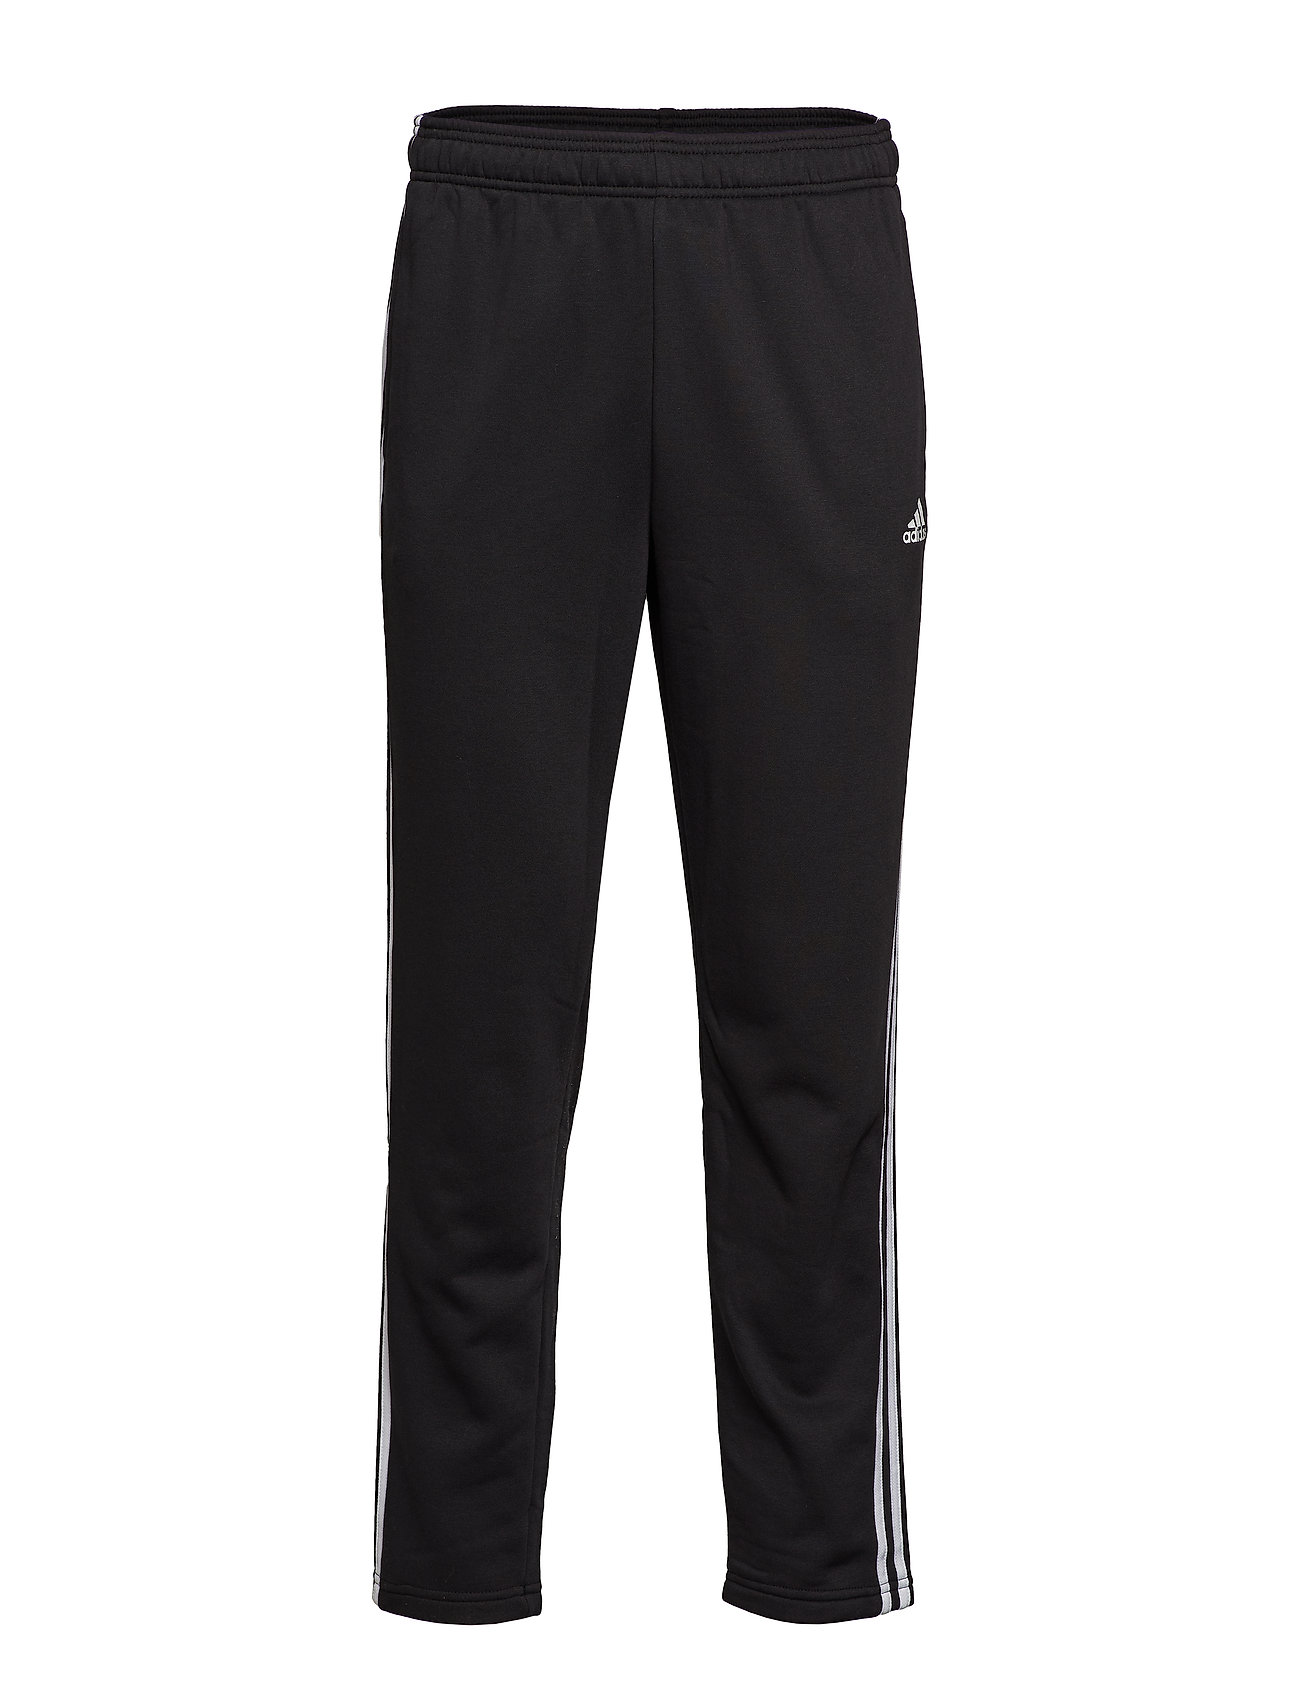 adidas Tennis ESS 3 STRIPE PANT - BLACK